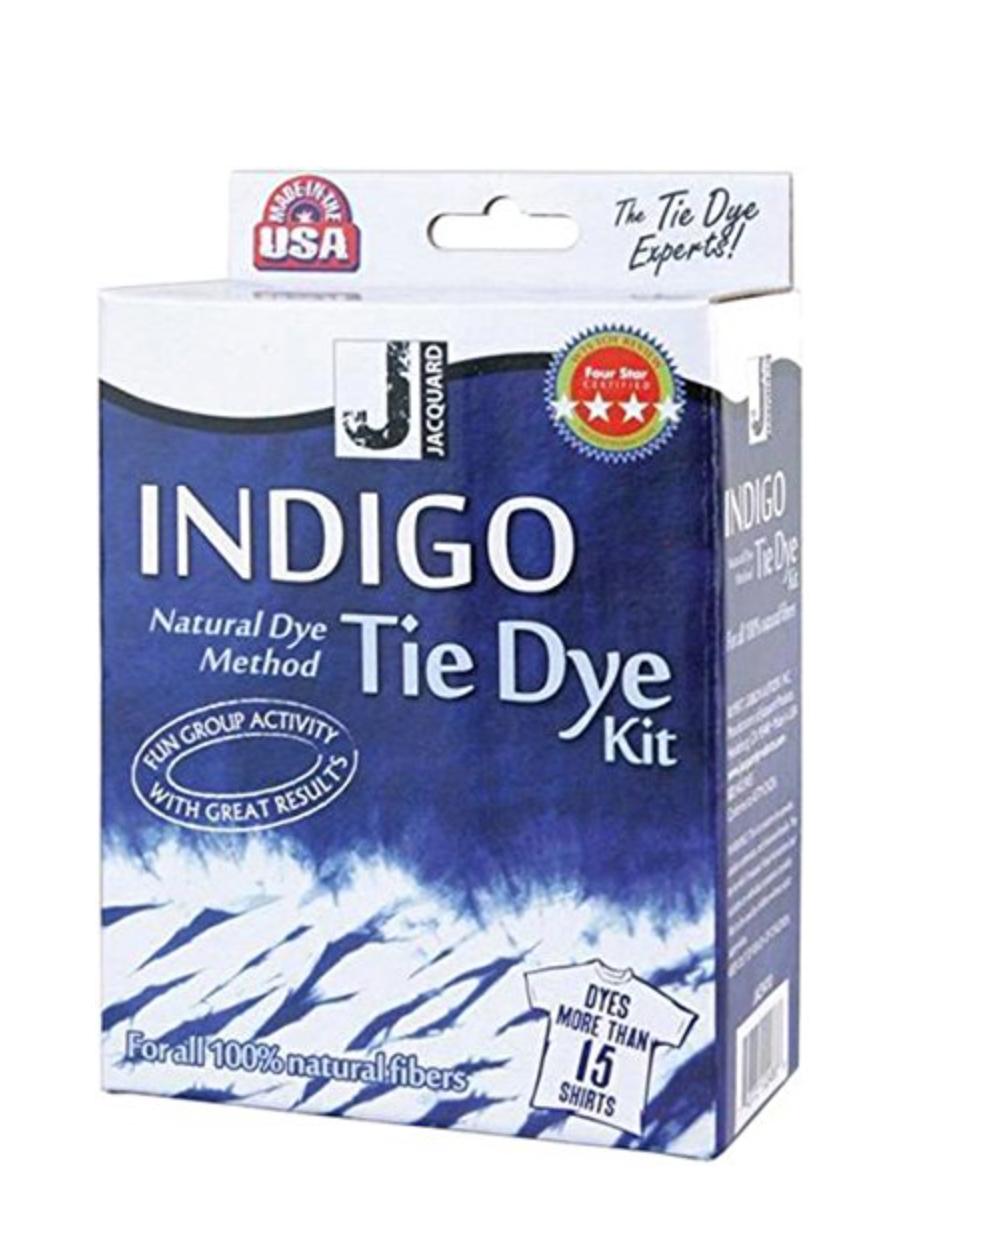 indigo copy.jpg